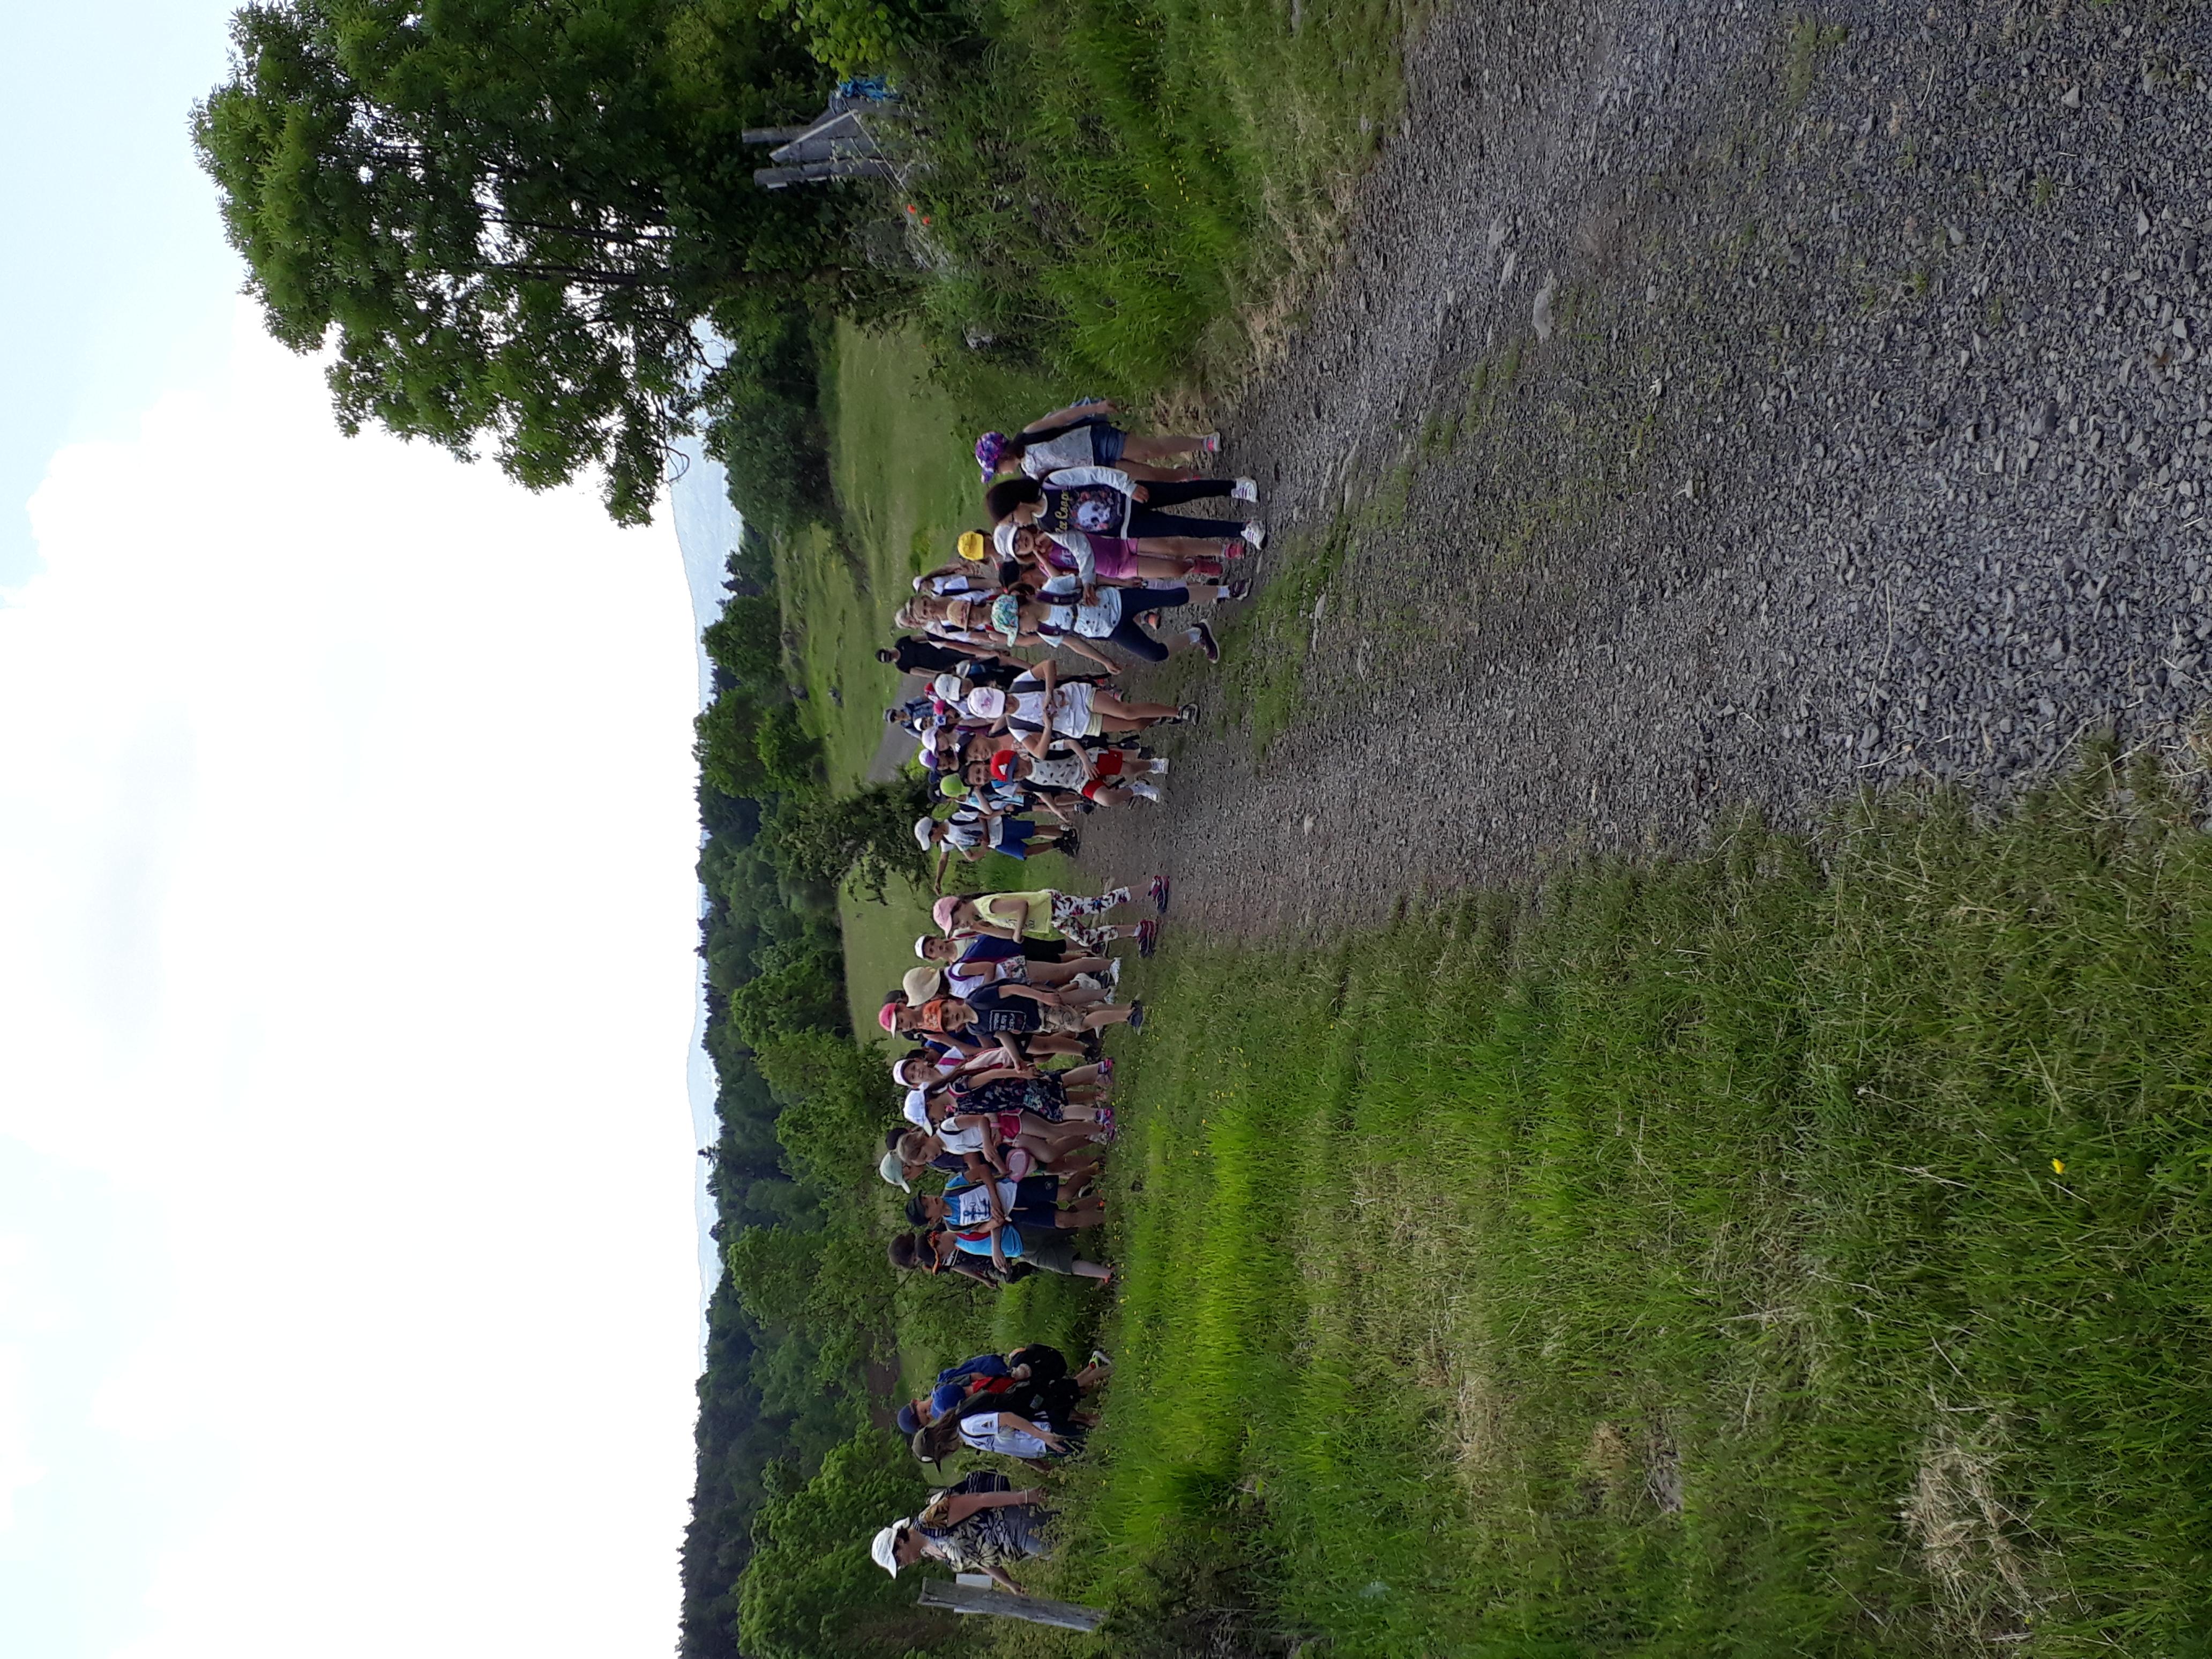 Chemin saintjacques